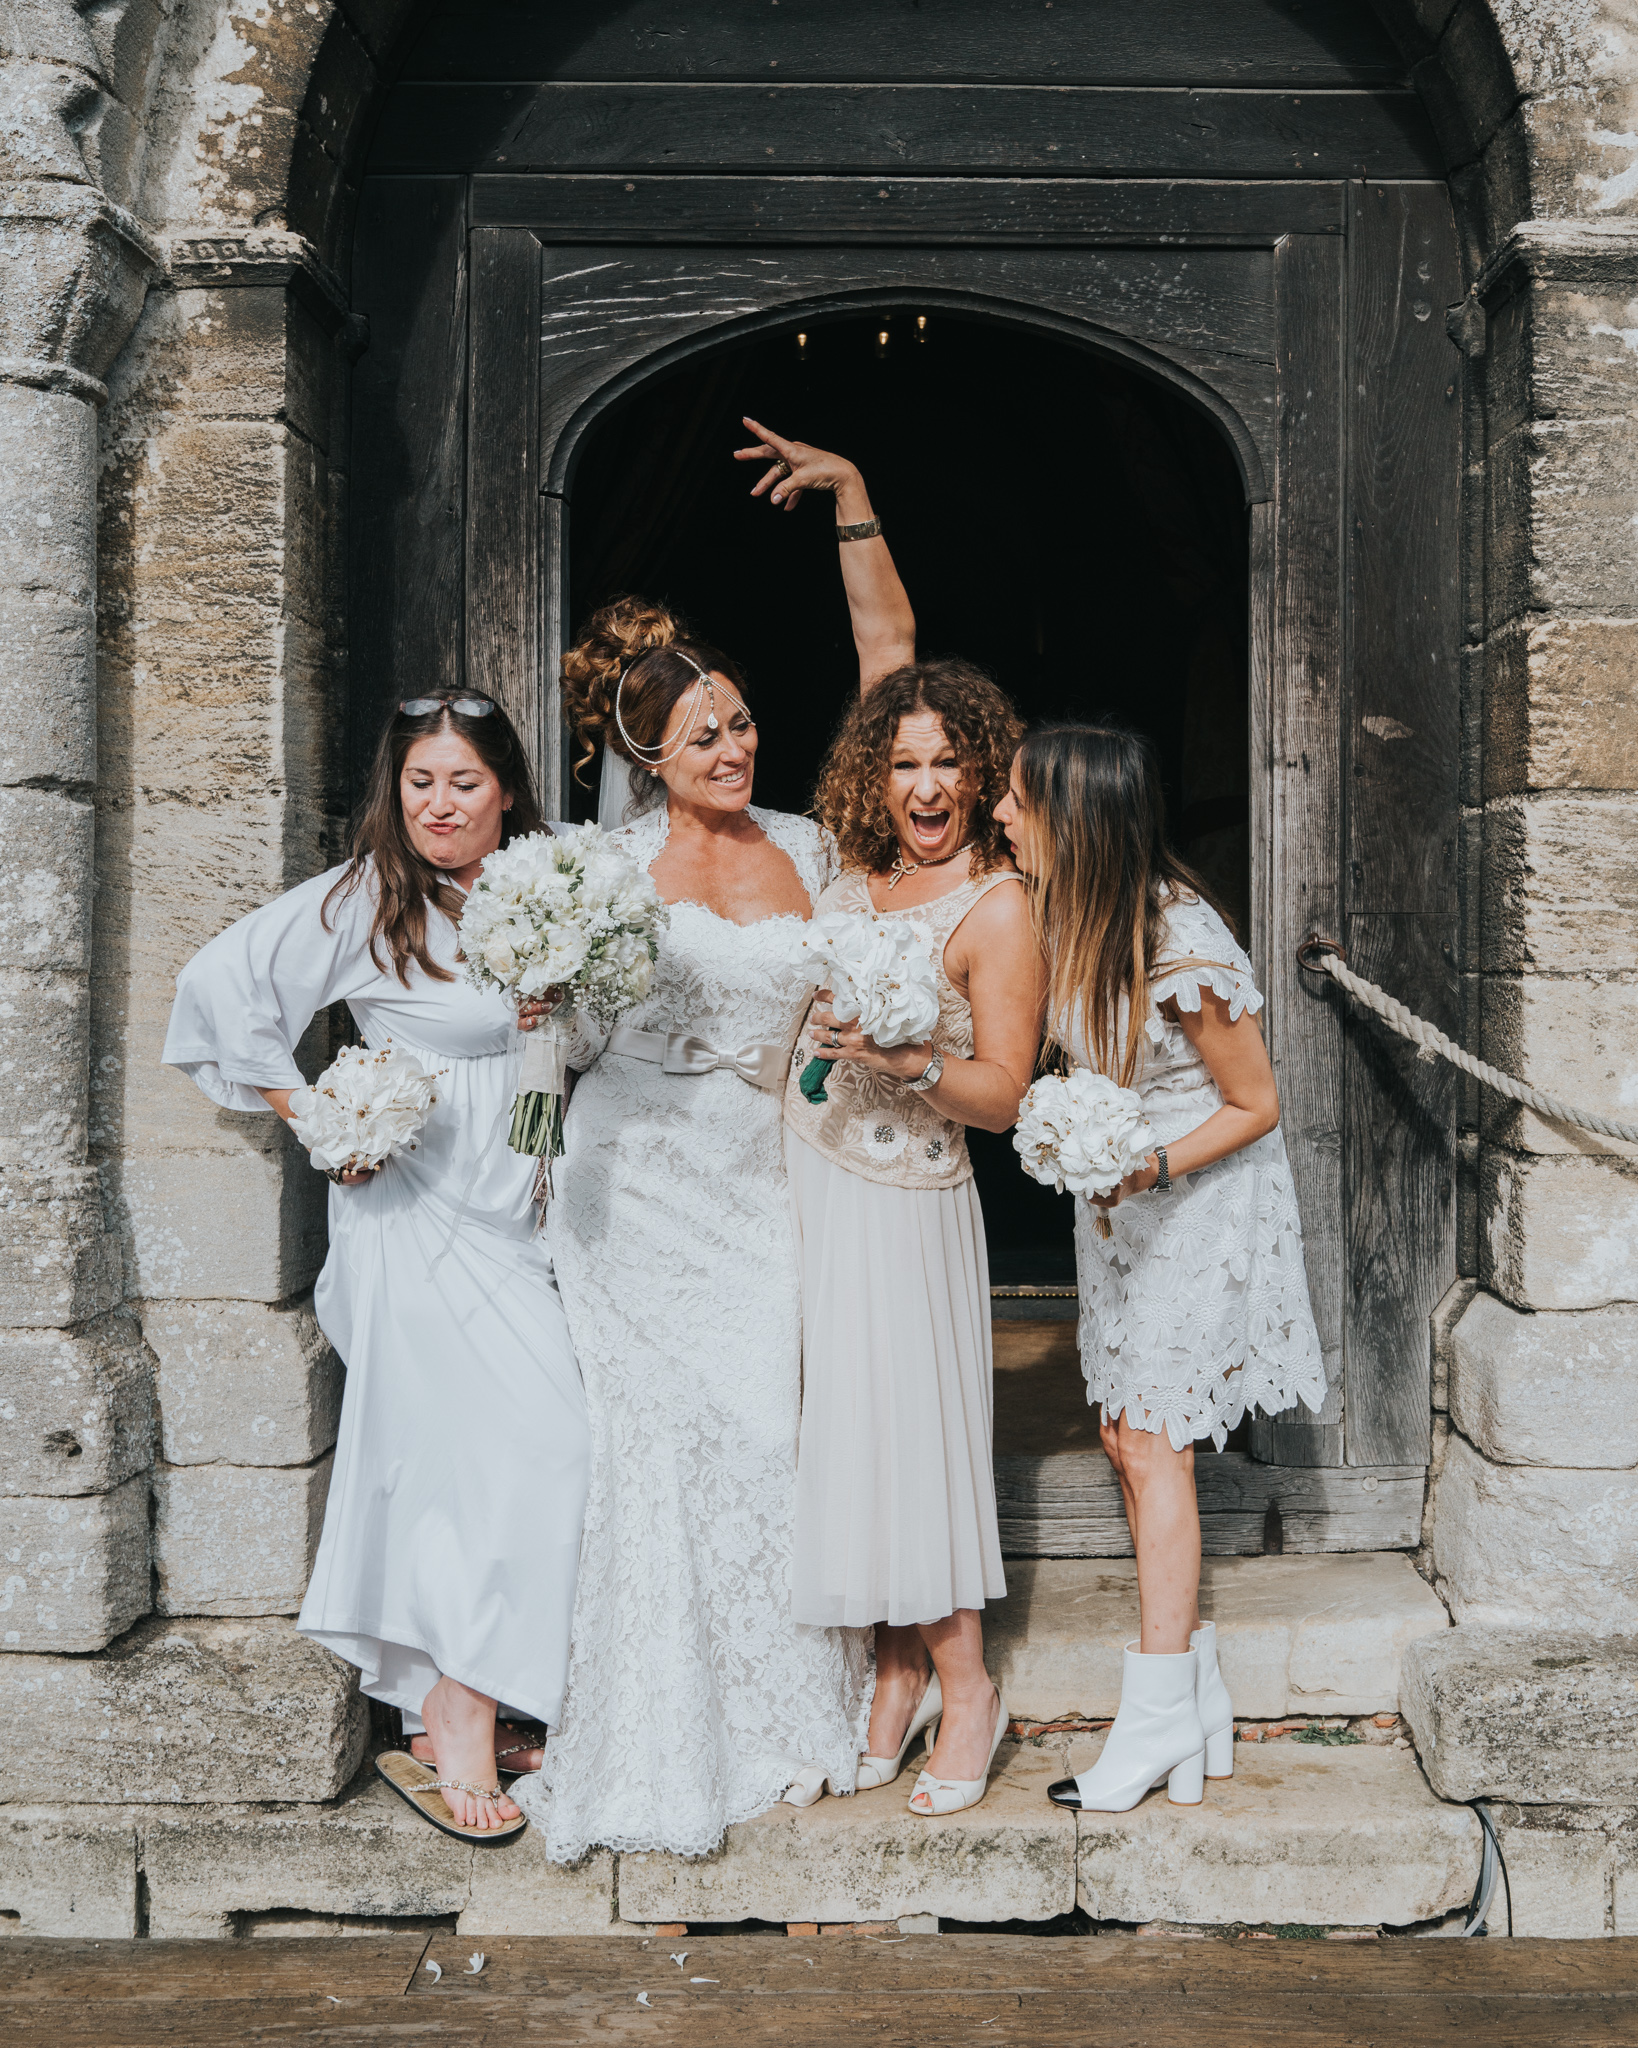 grace-elizabeth-boho-wedding-headingham-castle-essex-wedding-photographer-61.jpg